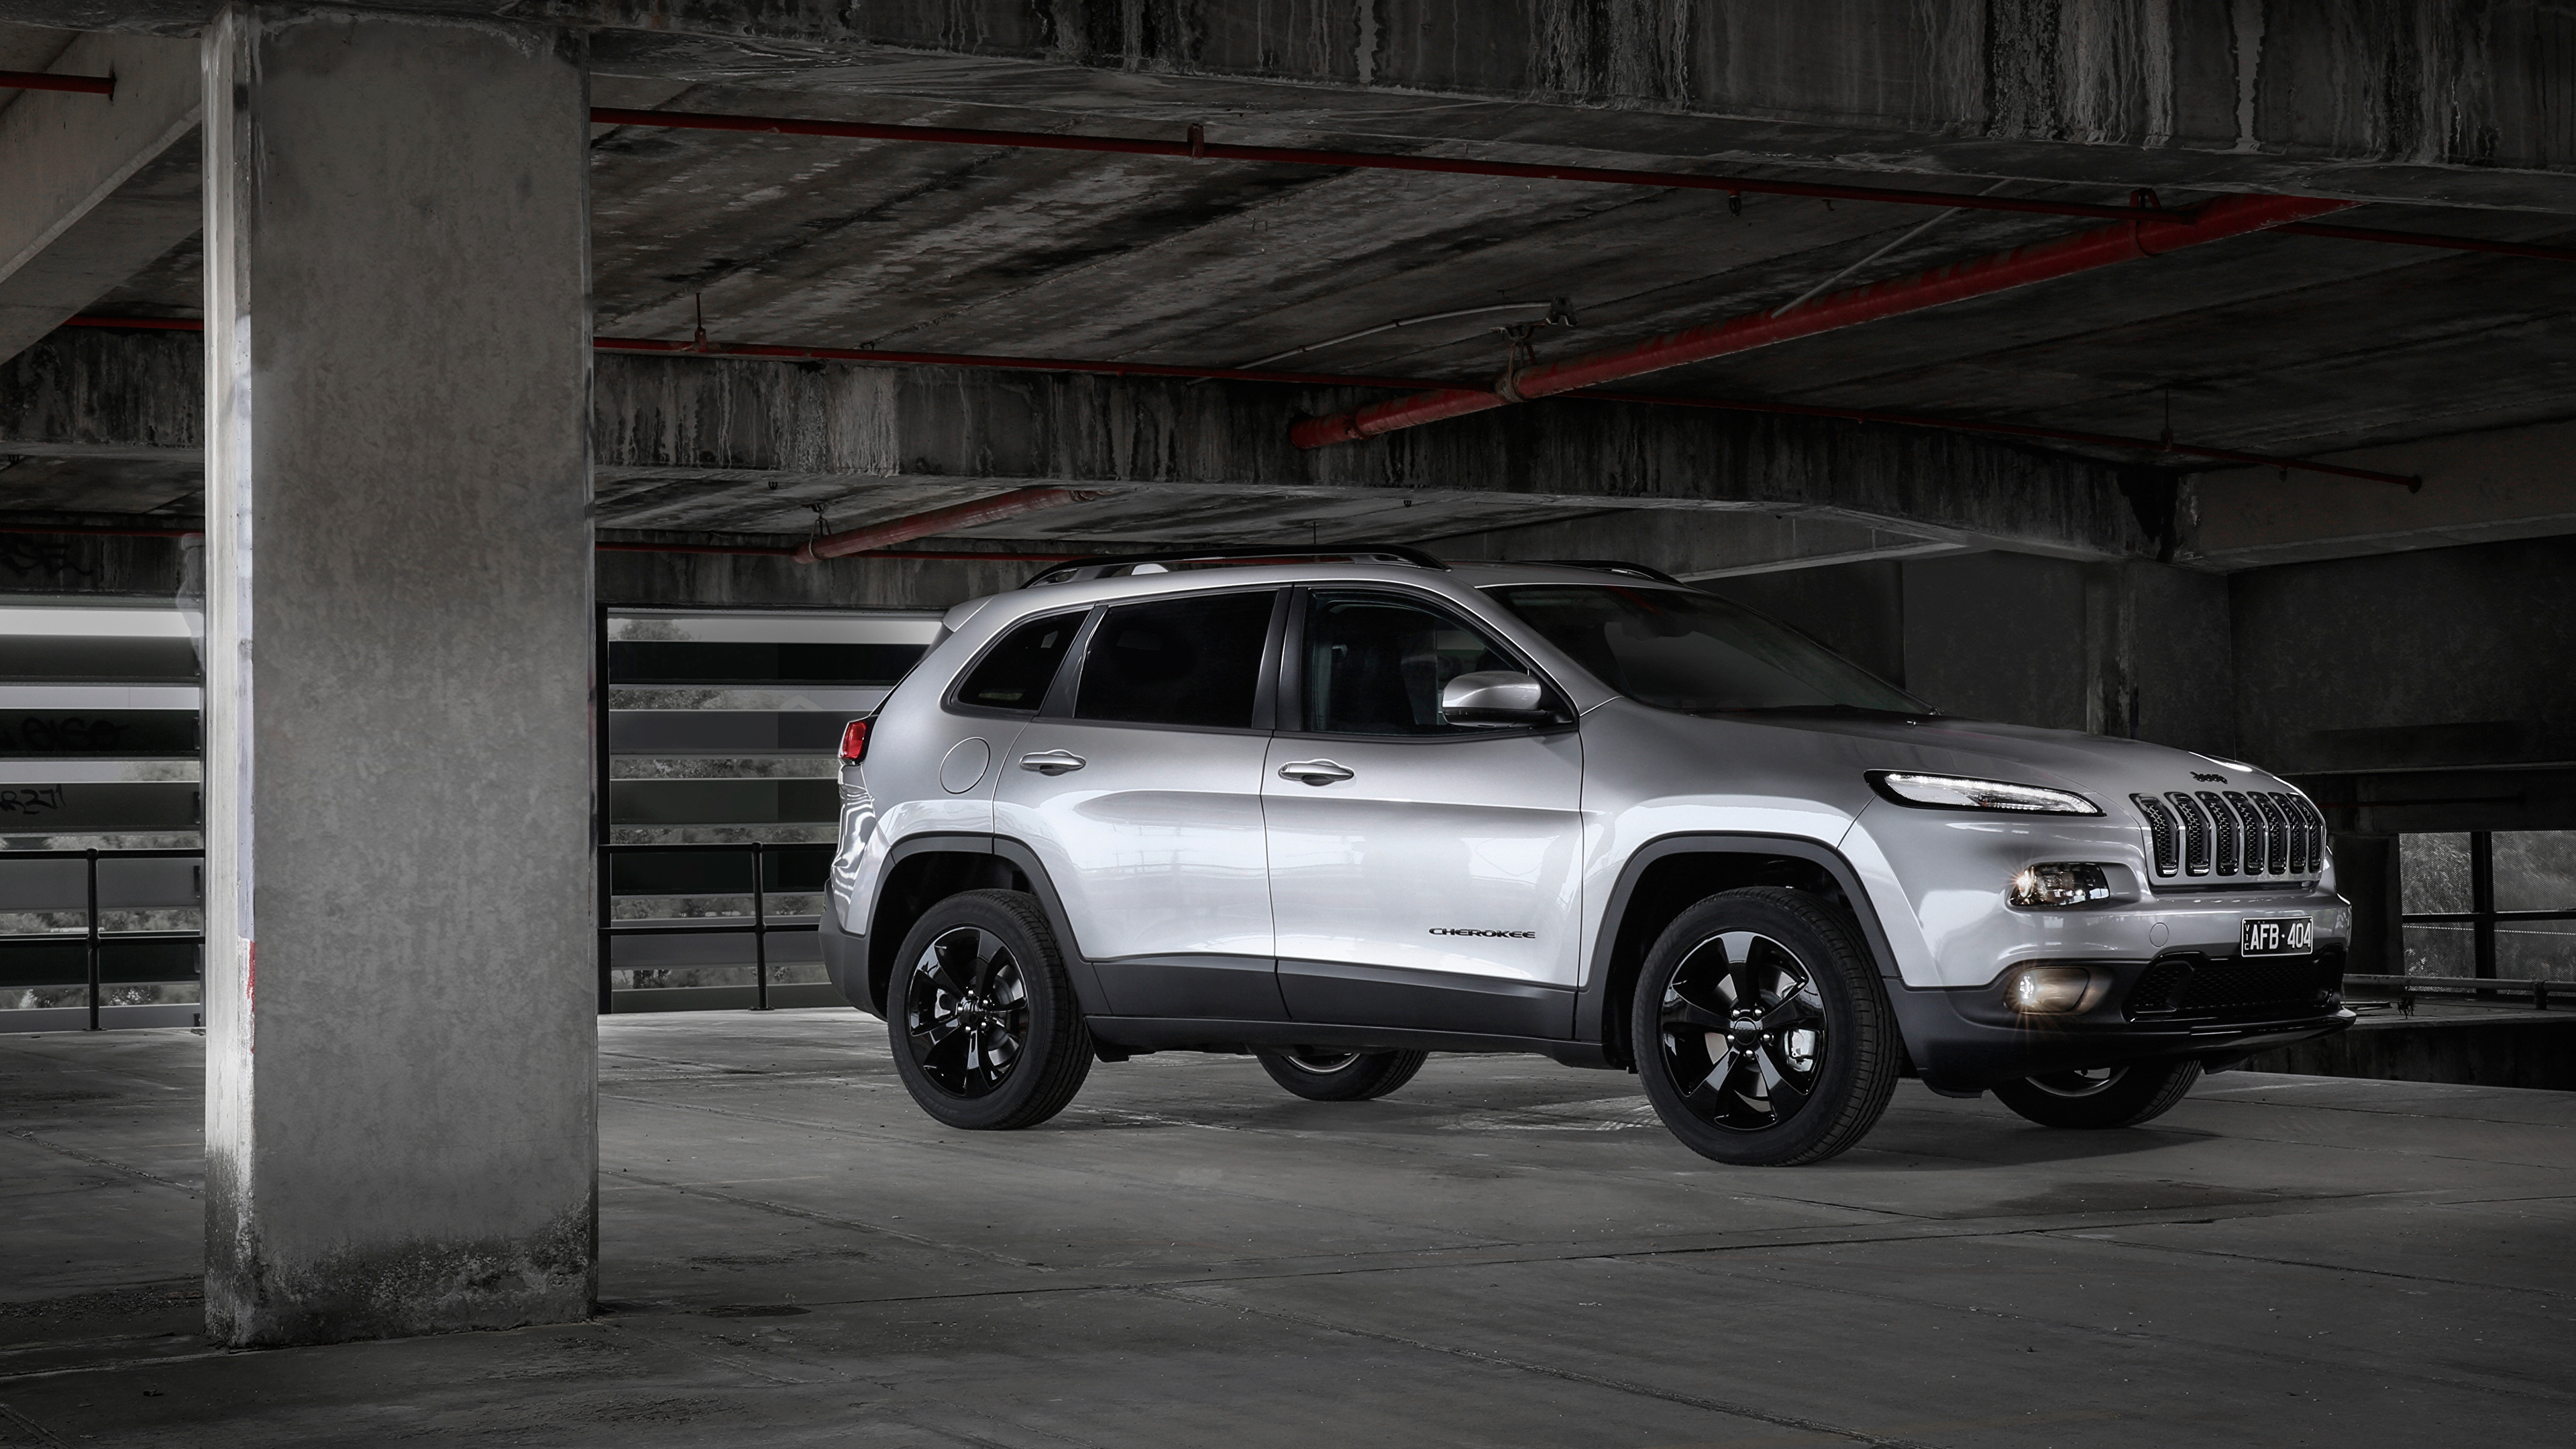 Papeis De Parede 3840x2160 Jeep Cherokee 2015 Blackhawk Prata Cor Lateralmente Carros Baixar Imagens